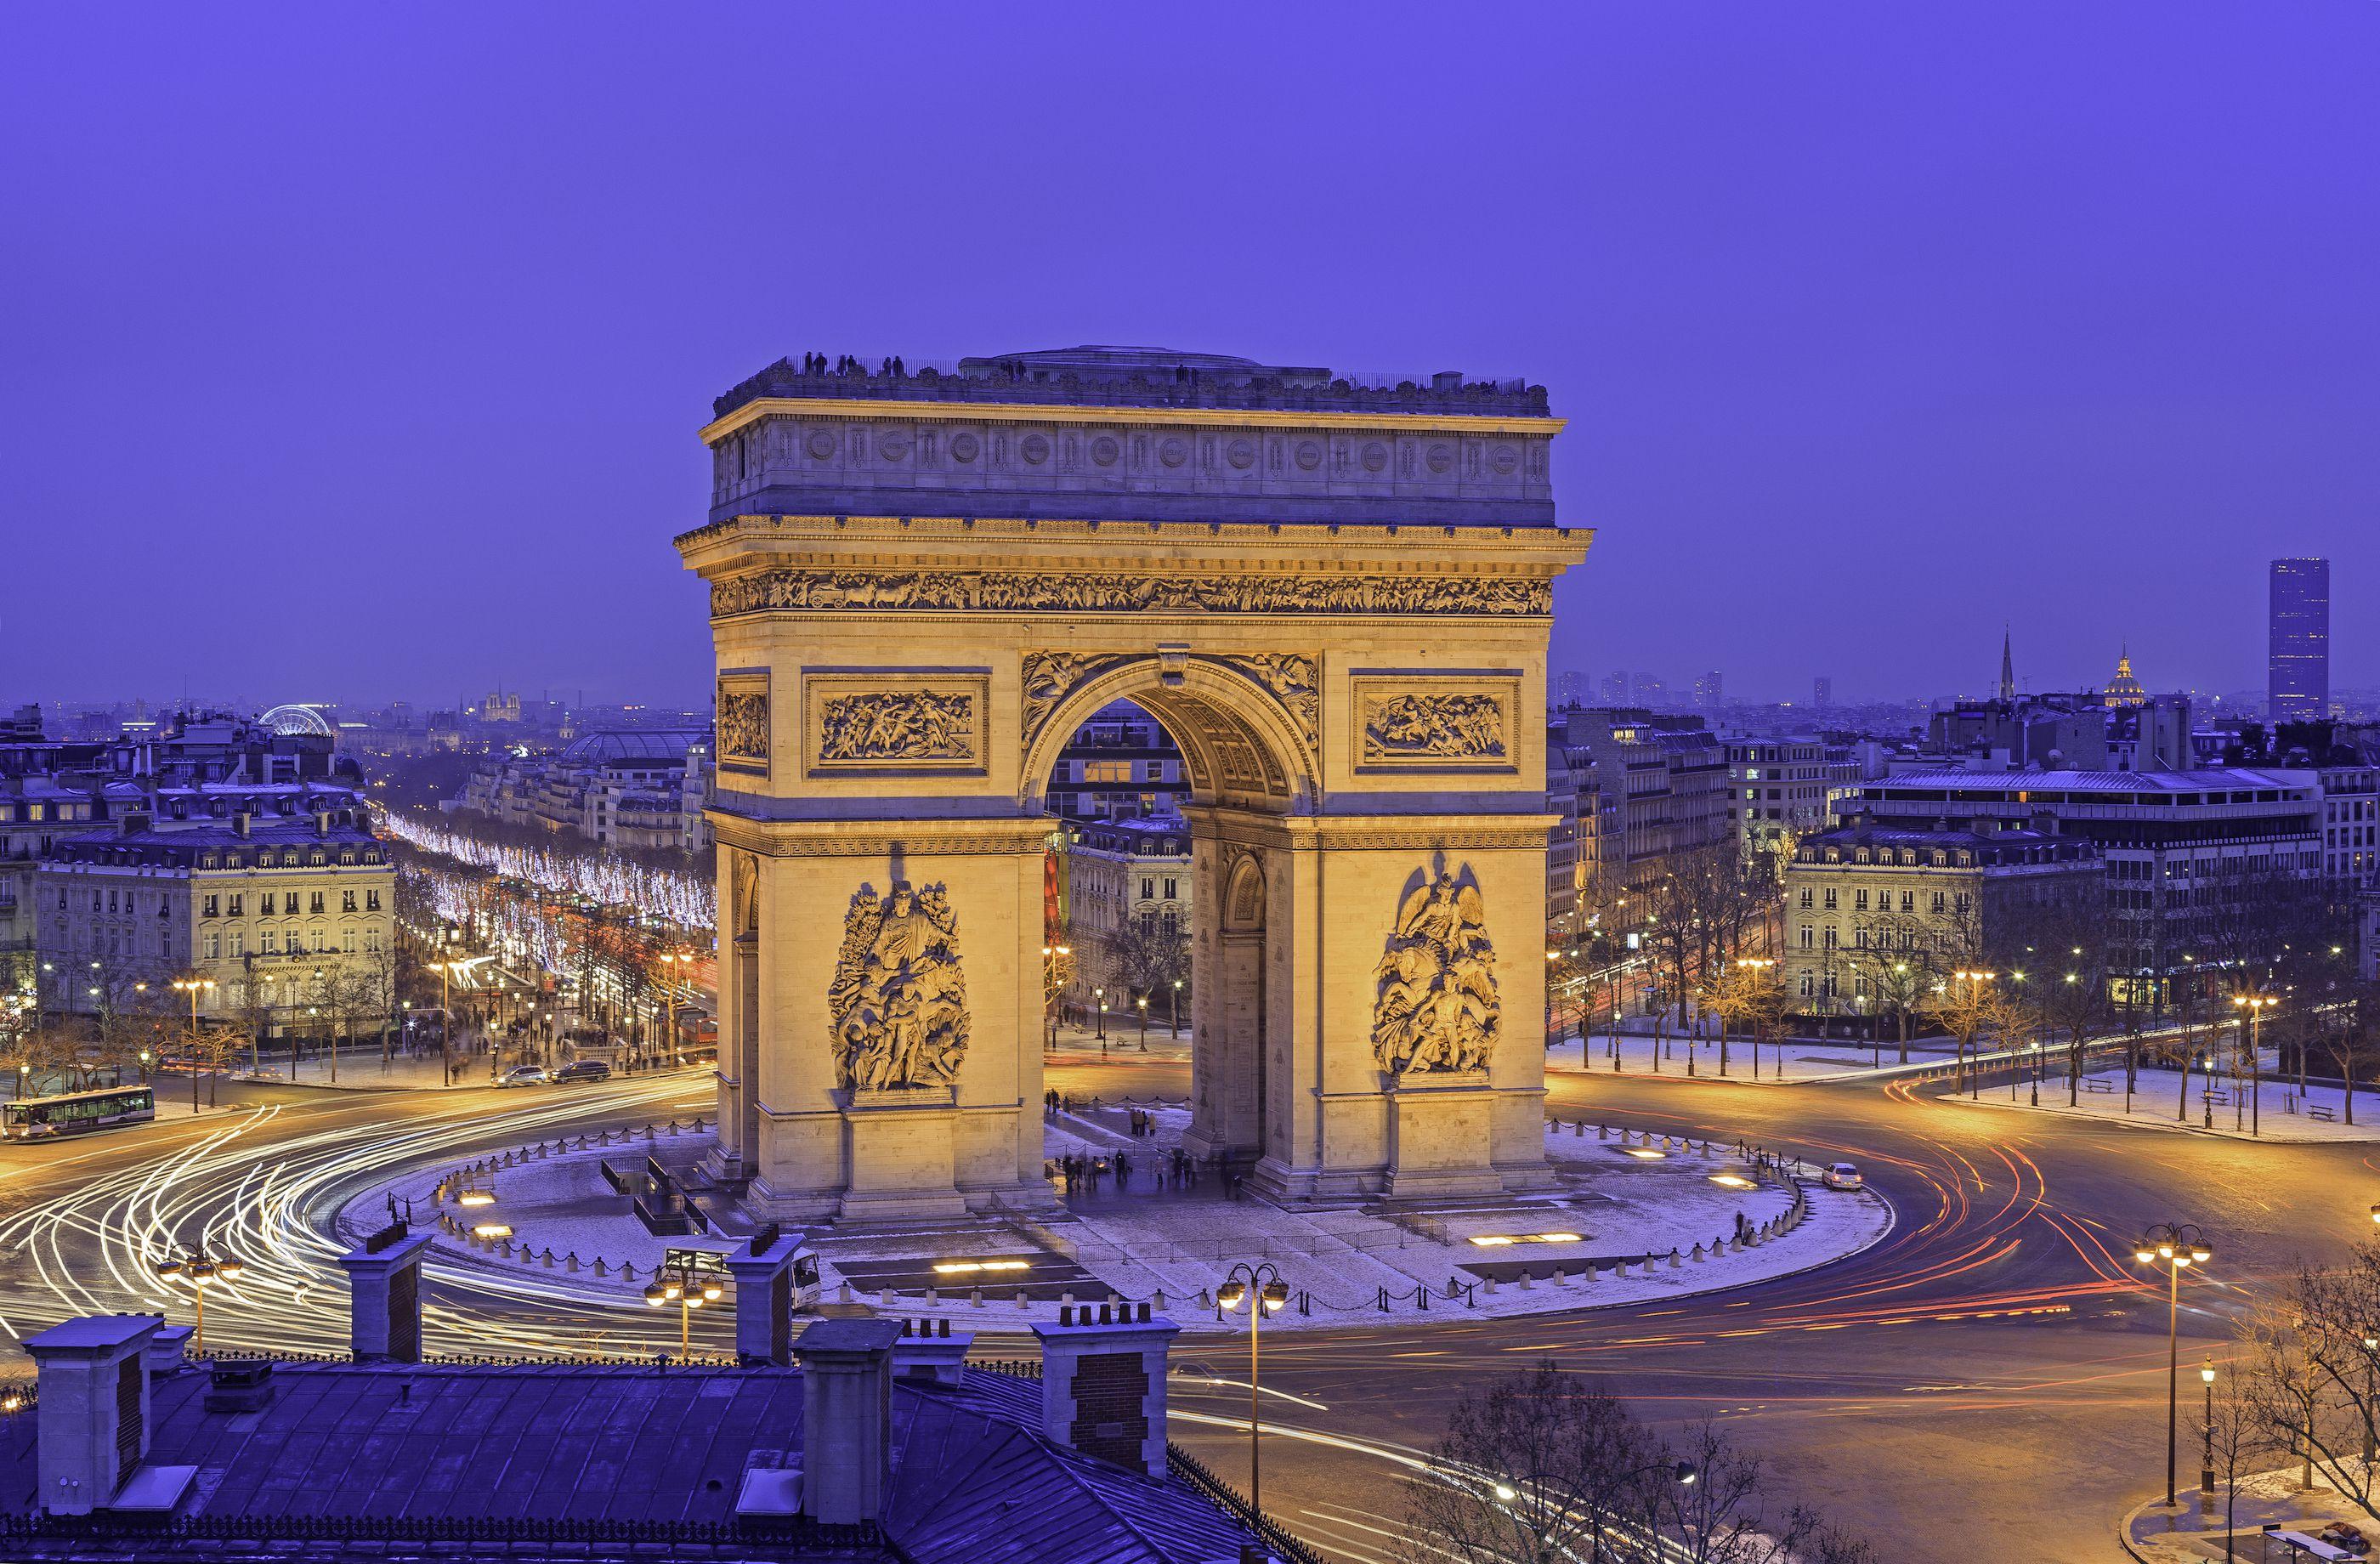 The Arc de Triomphe in Paris: Complete Visitors' Guide